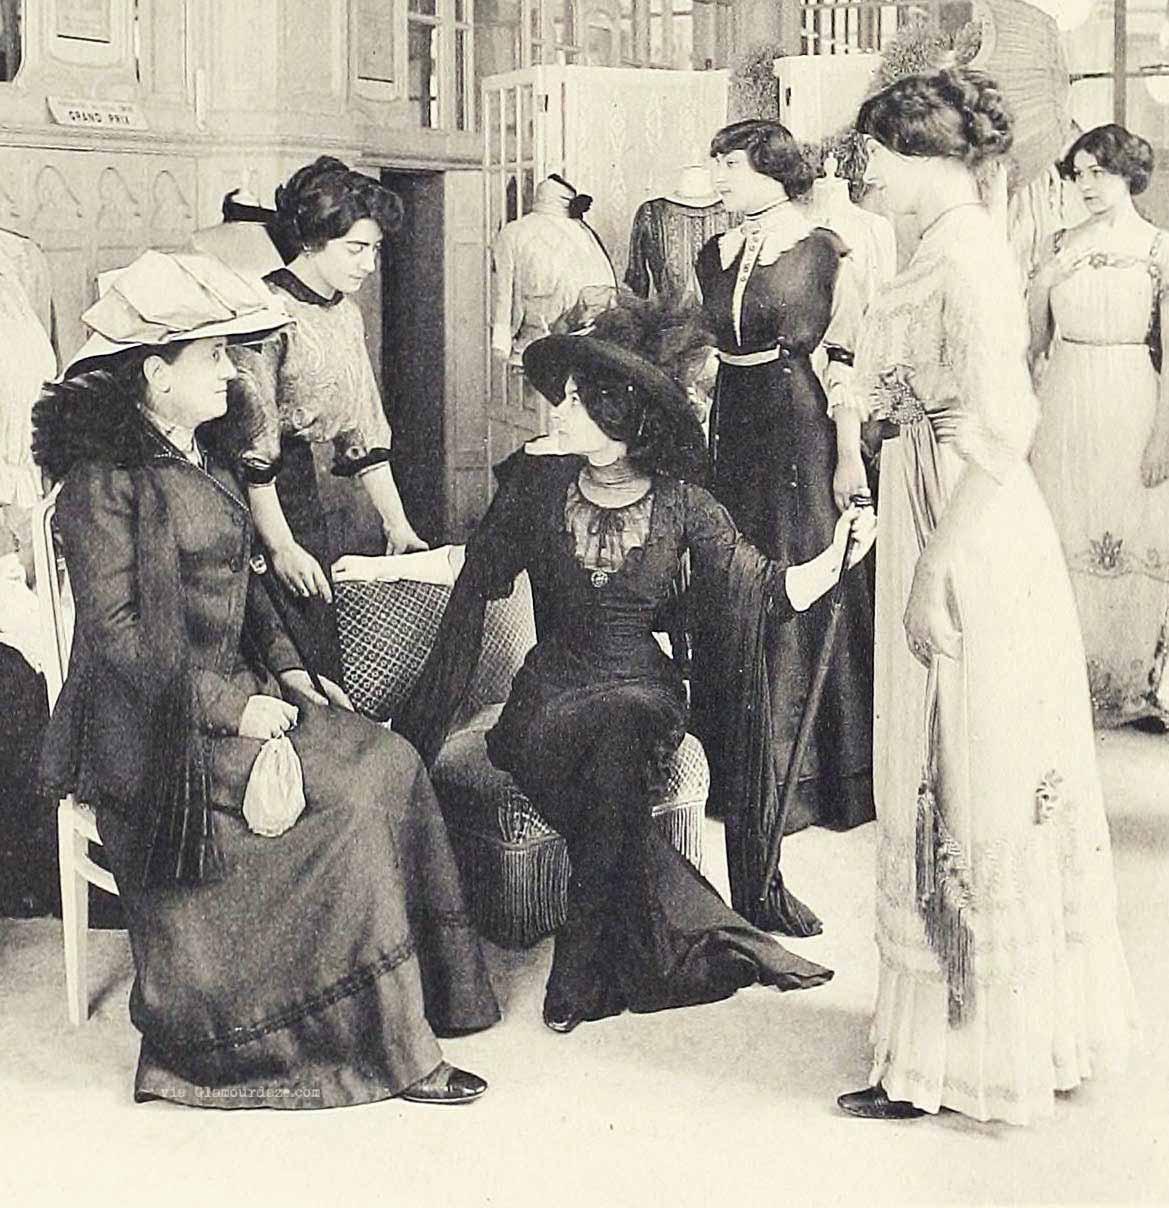 house-of-redfern-galerie-de-vente-paris-fashion-1910.jpg